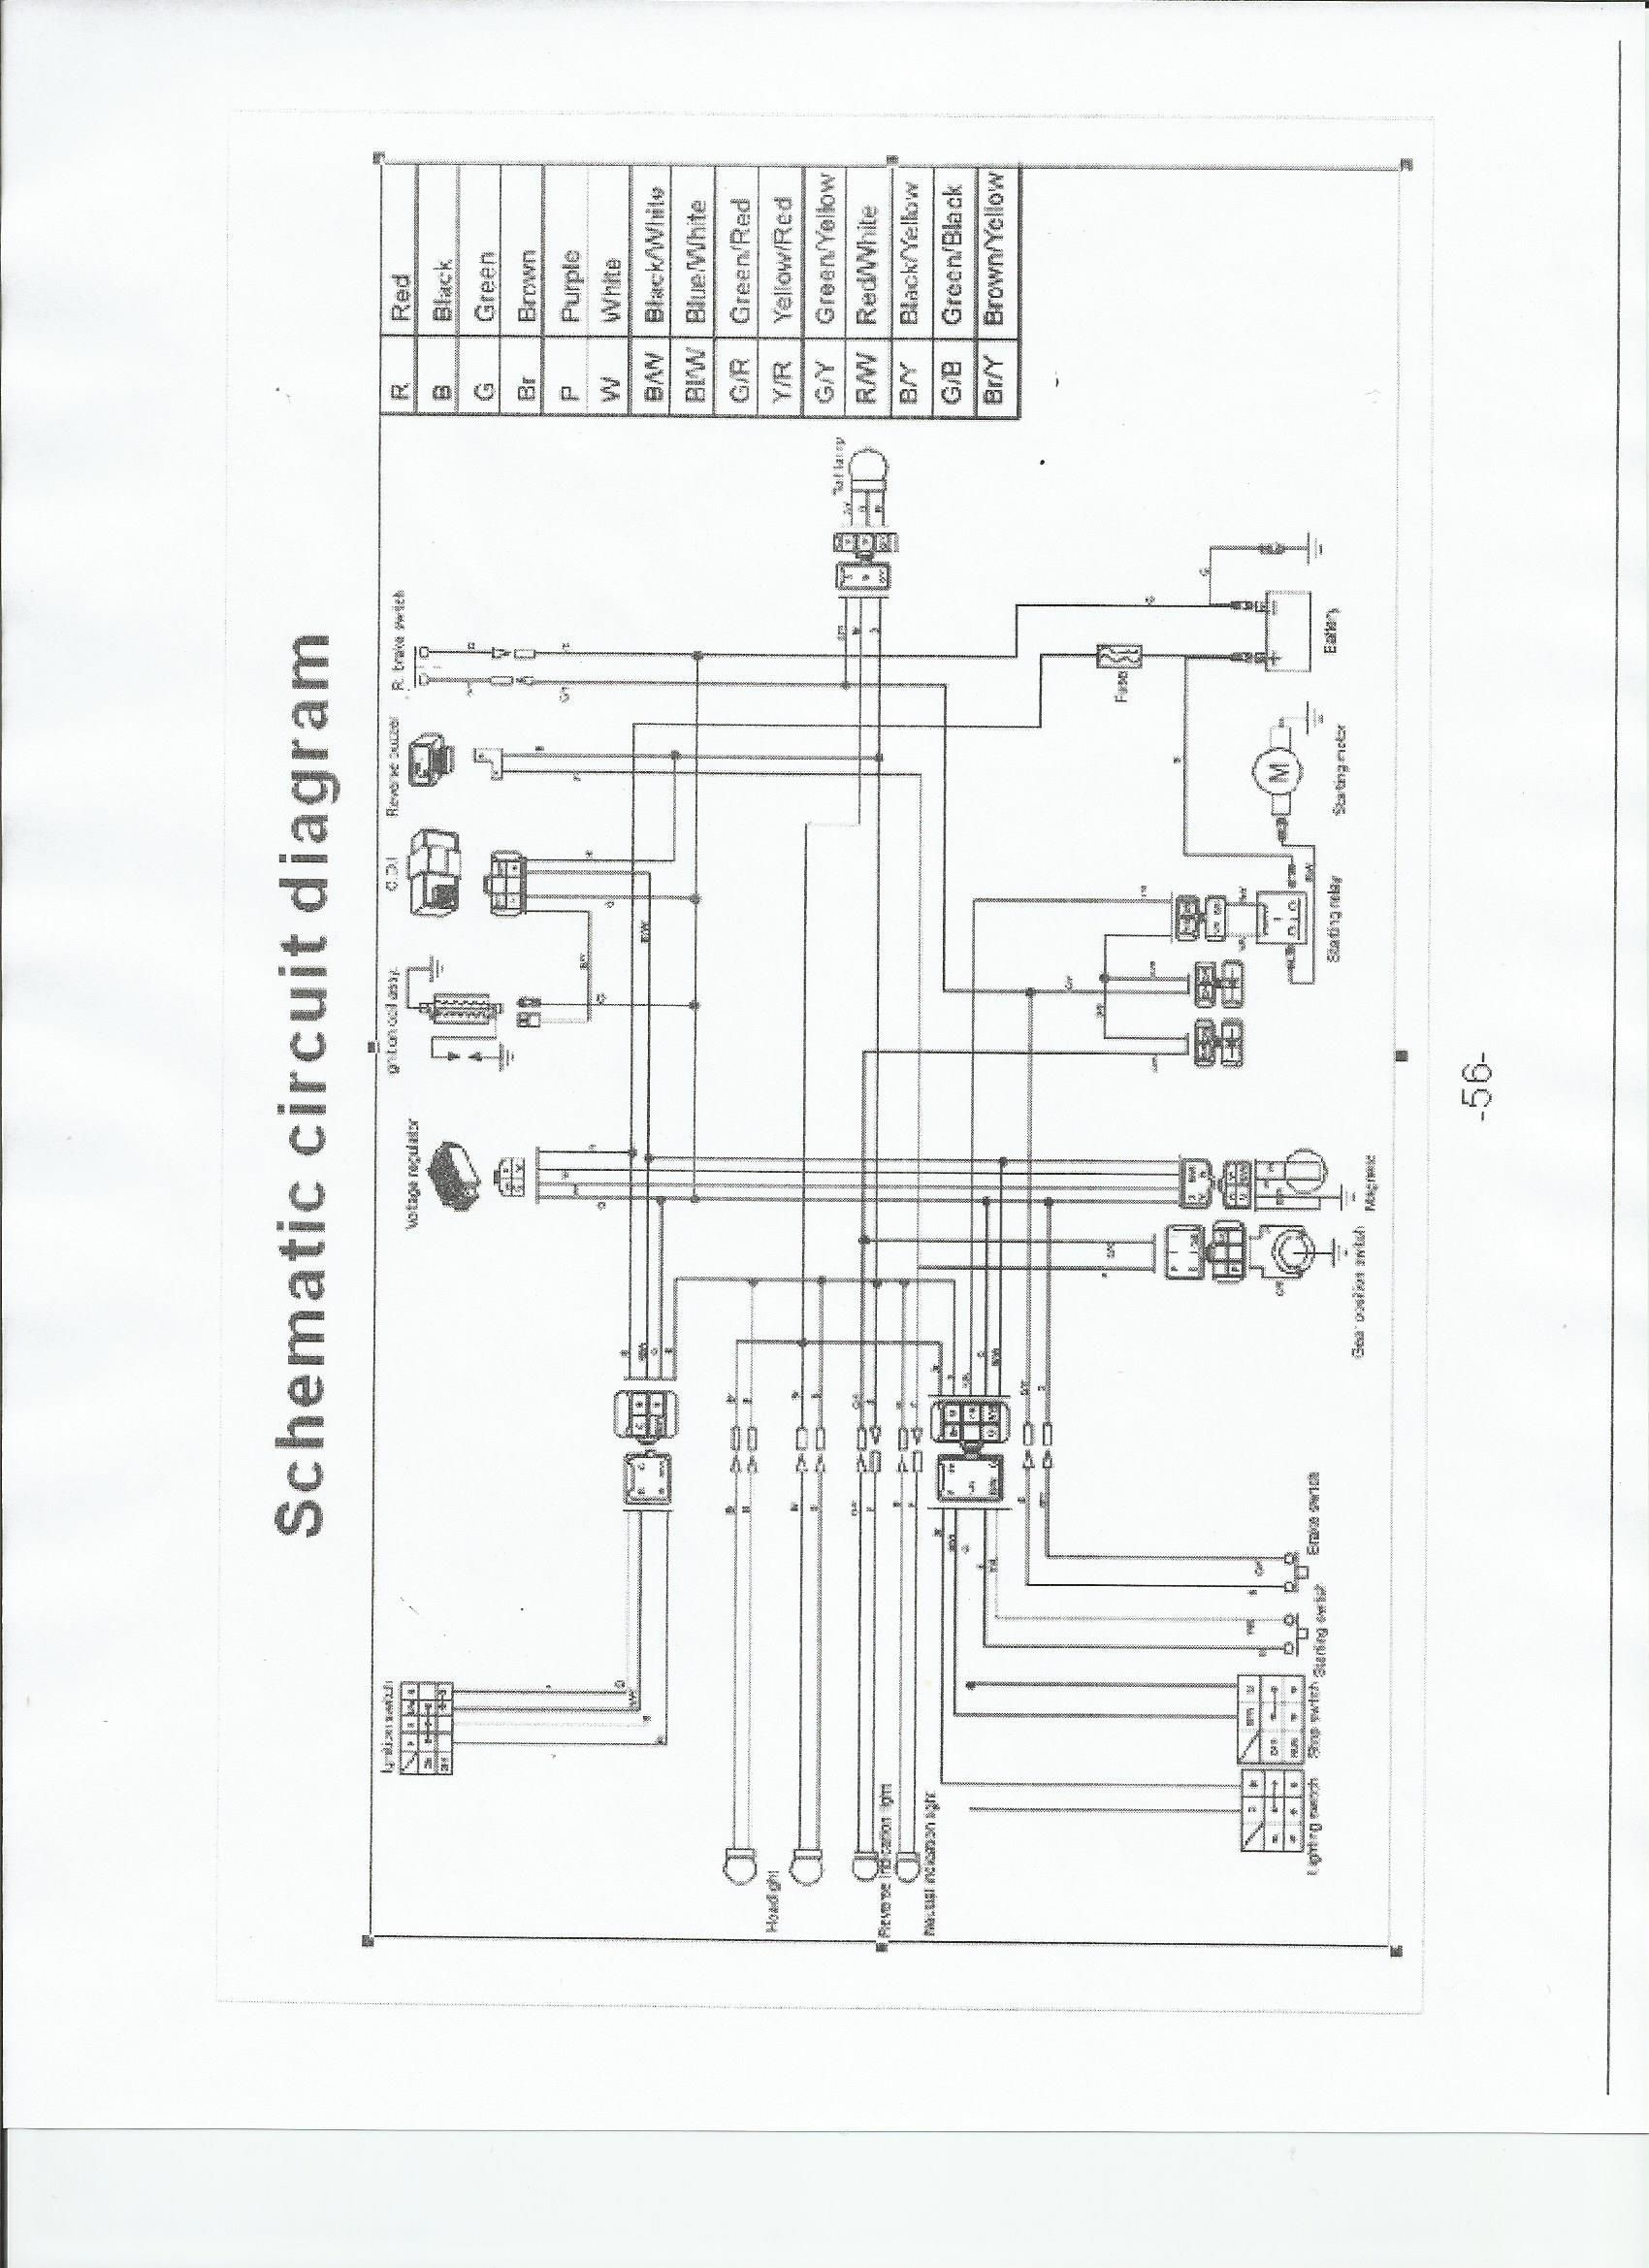 2007 Dodge Nitro Tail Light Wiring Diagram